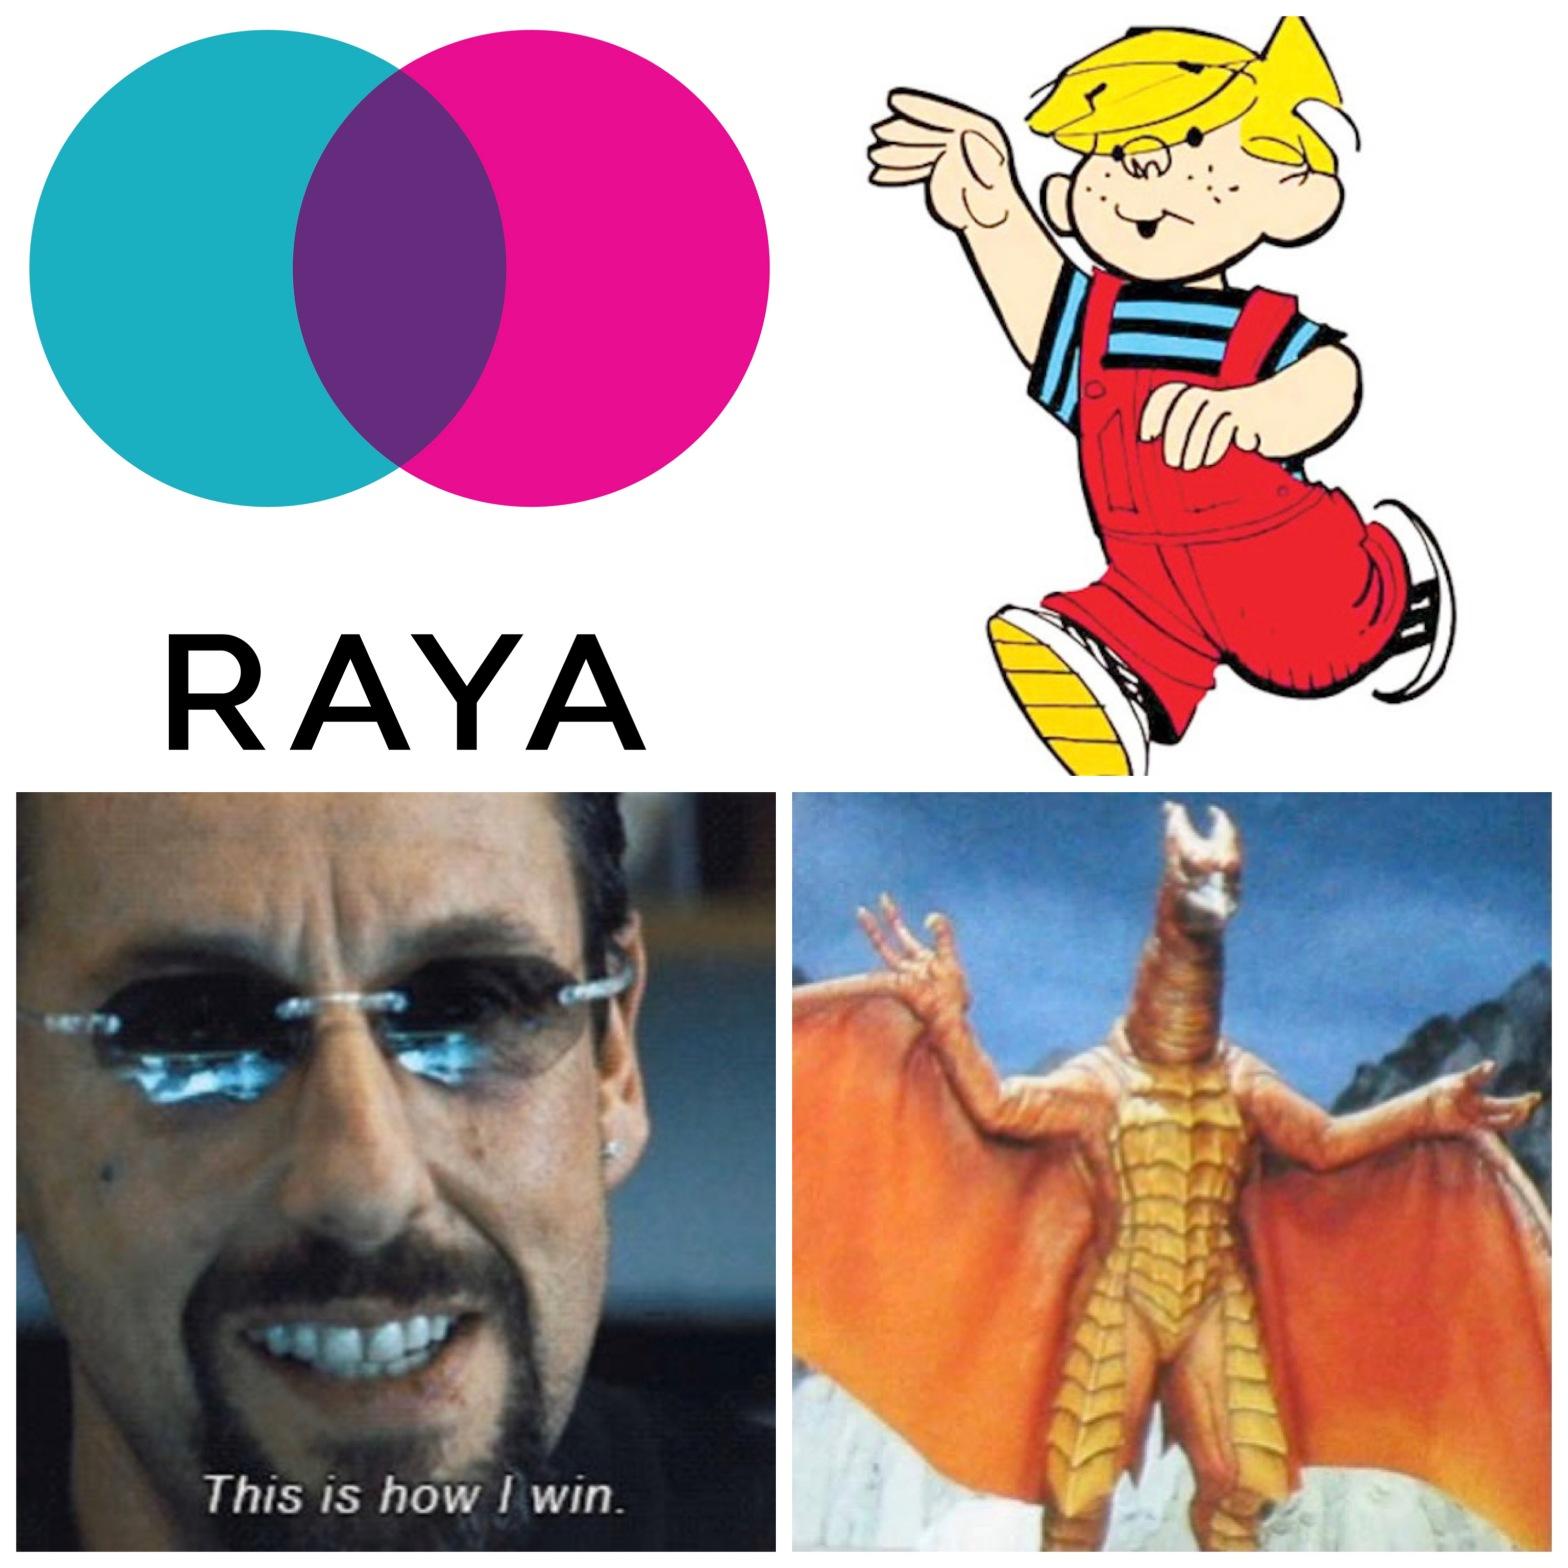 The dating app Raya, Dennis the Menace, Adam Sandler from Uncut Gems, and the kaiju Rodan.